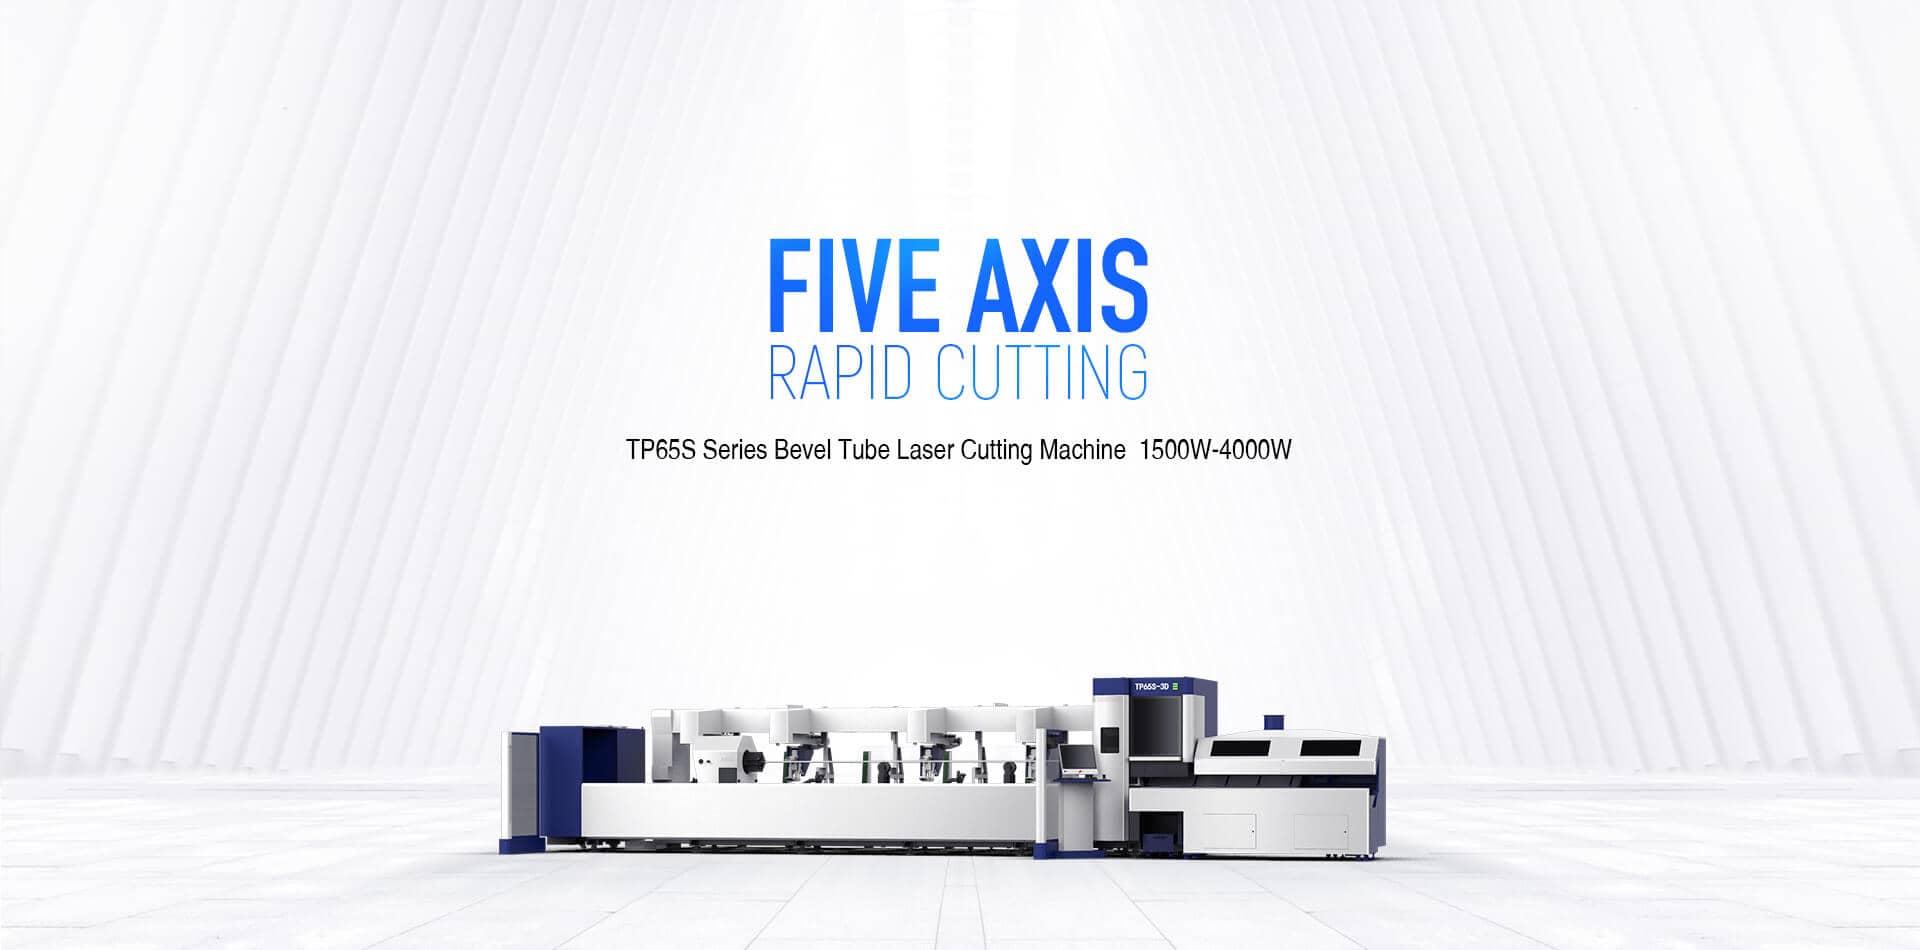 TP65S Series Groove Tube Laser Cutting Machine